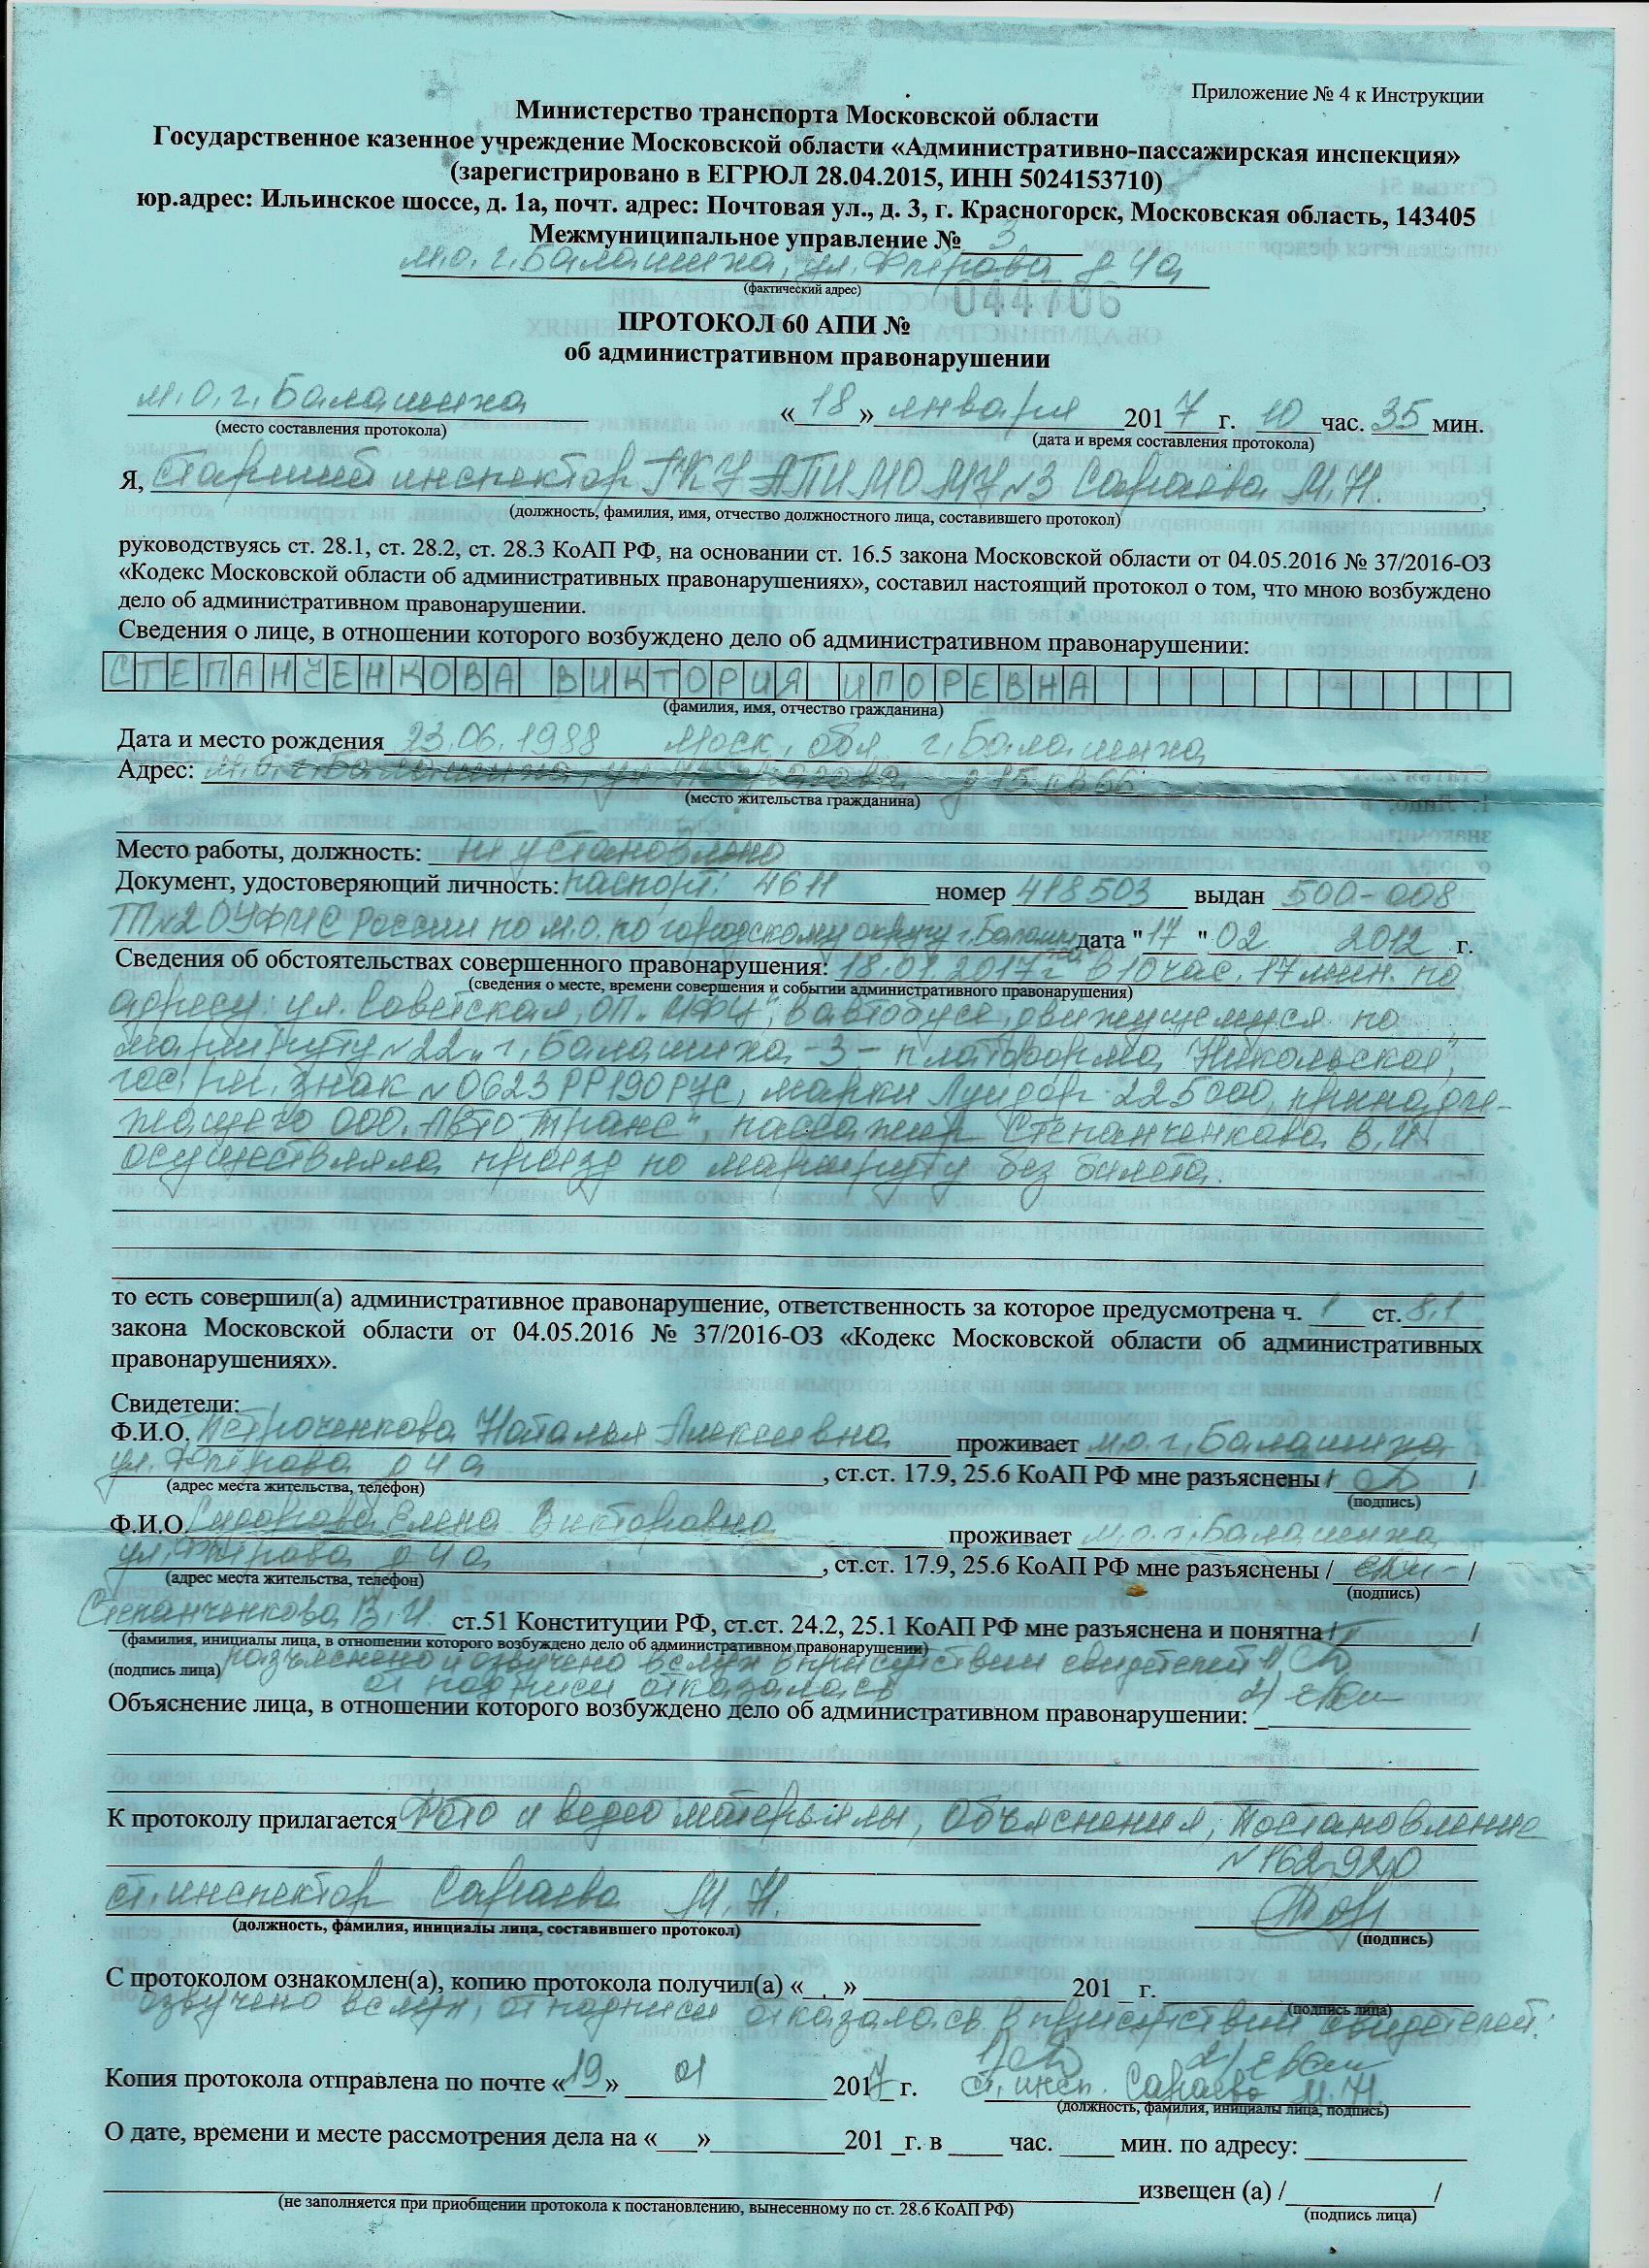 Наказание за неуплату штрафа за административное правонарушение